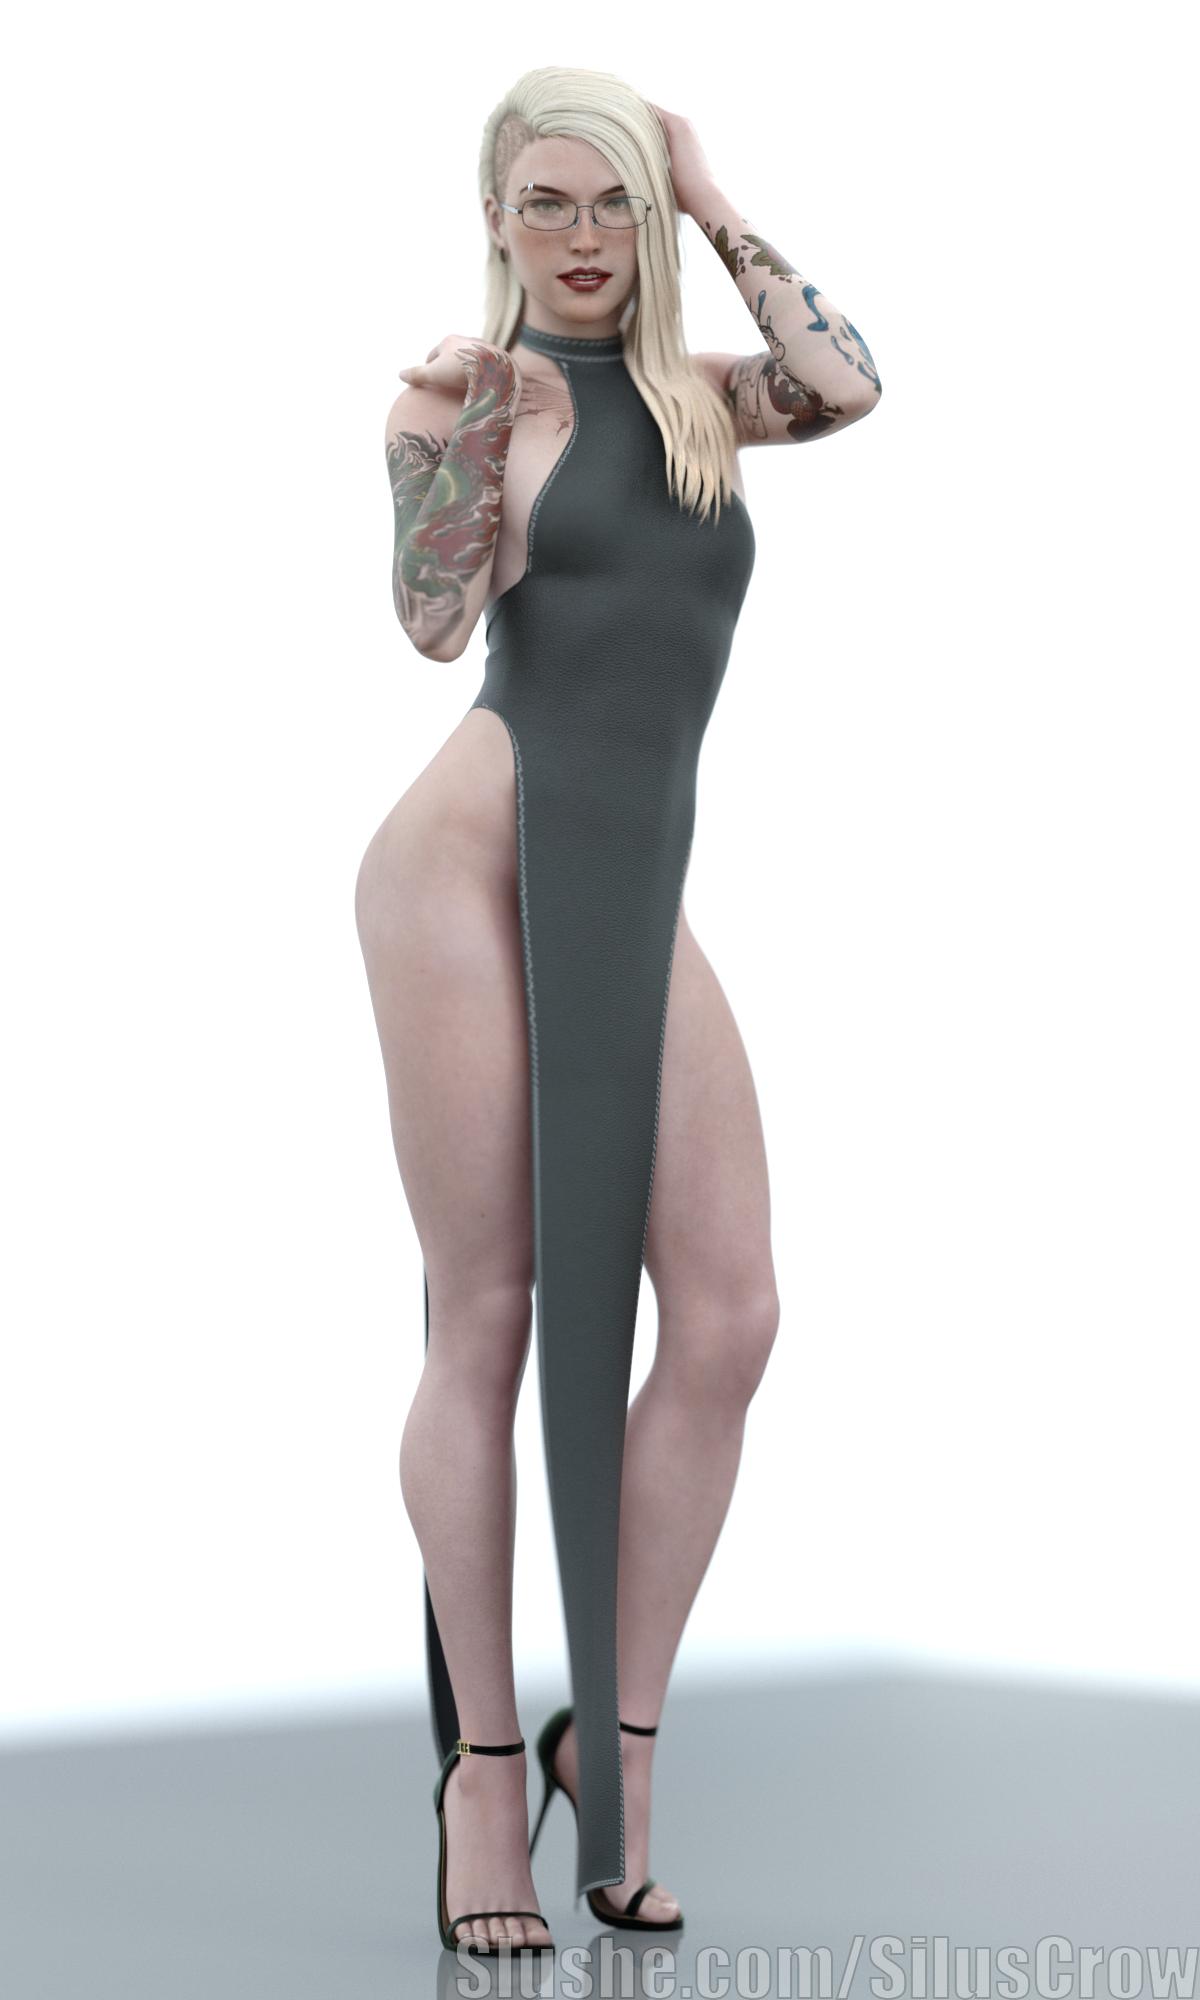 Erin - Backless Dress